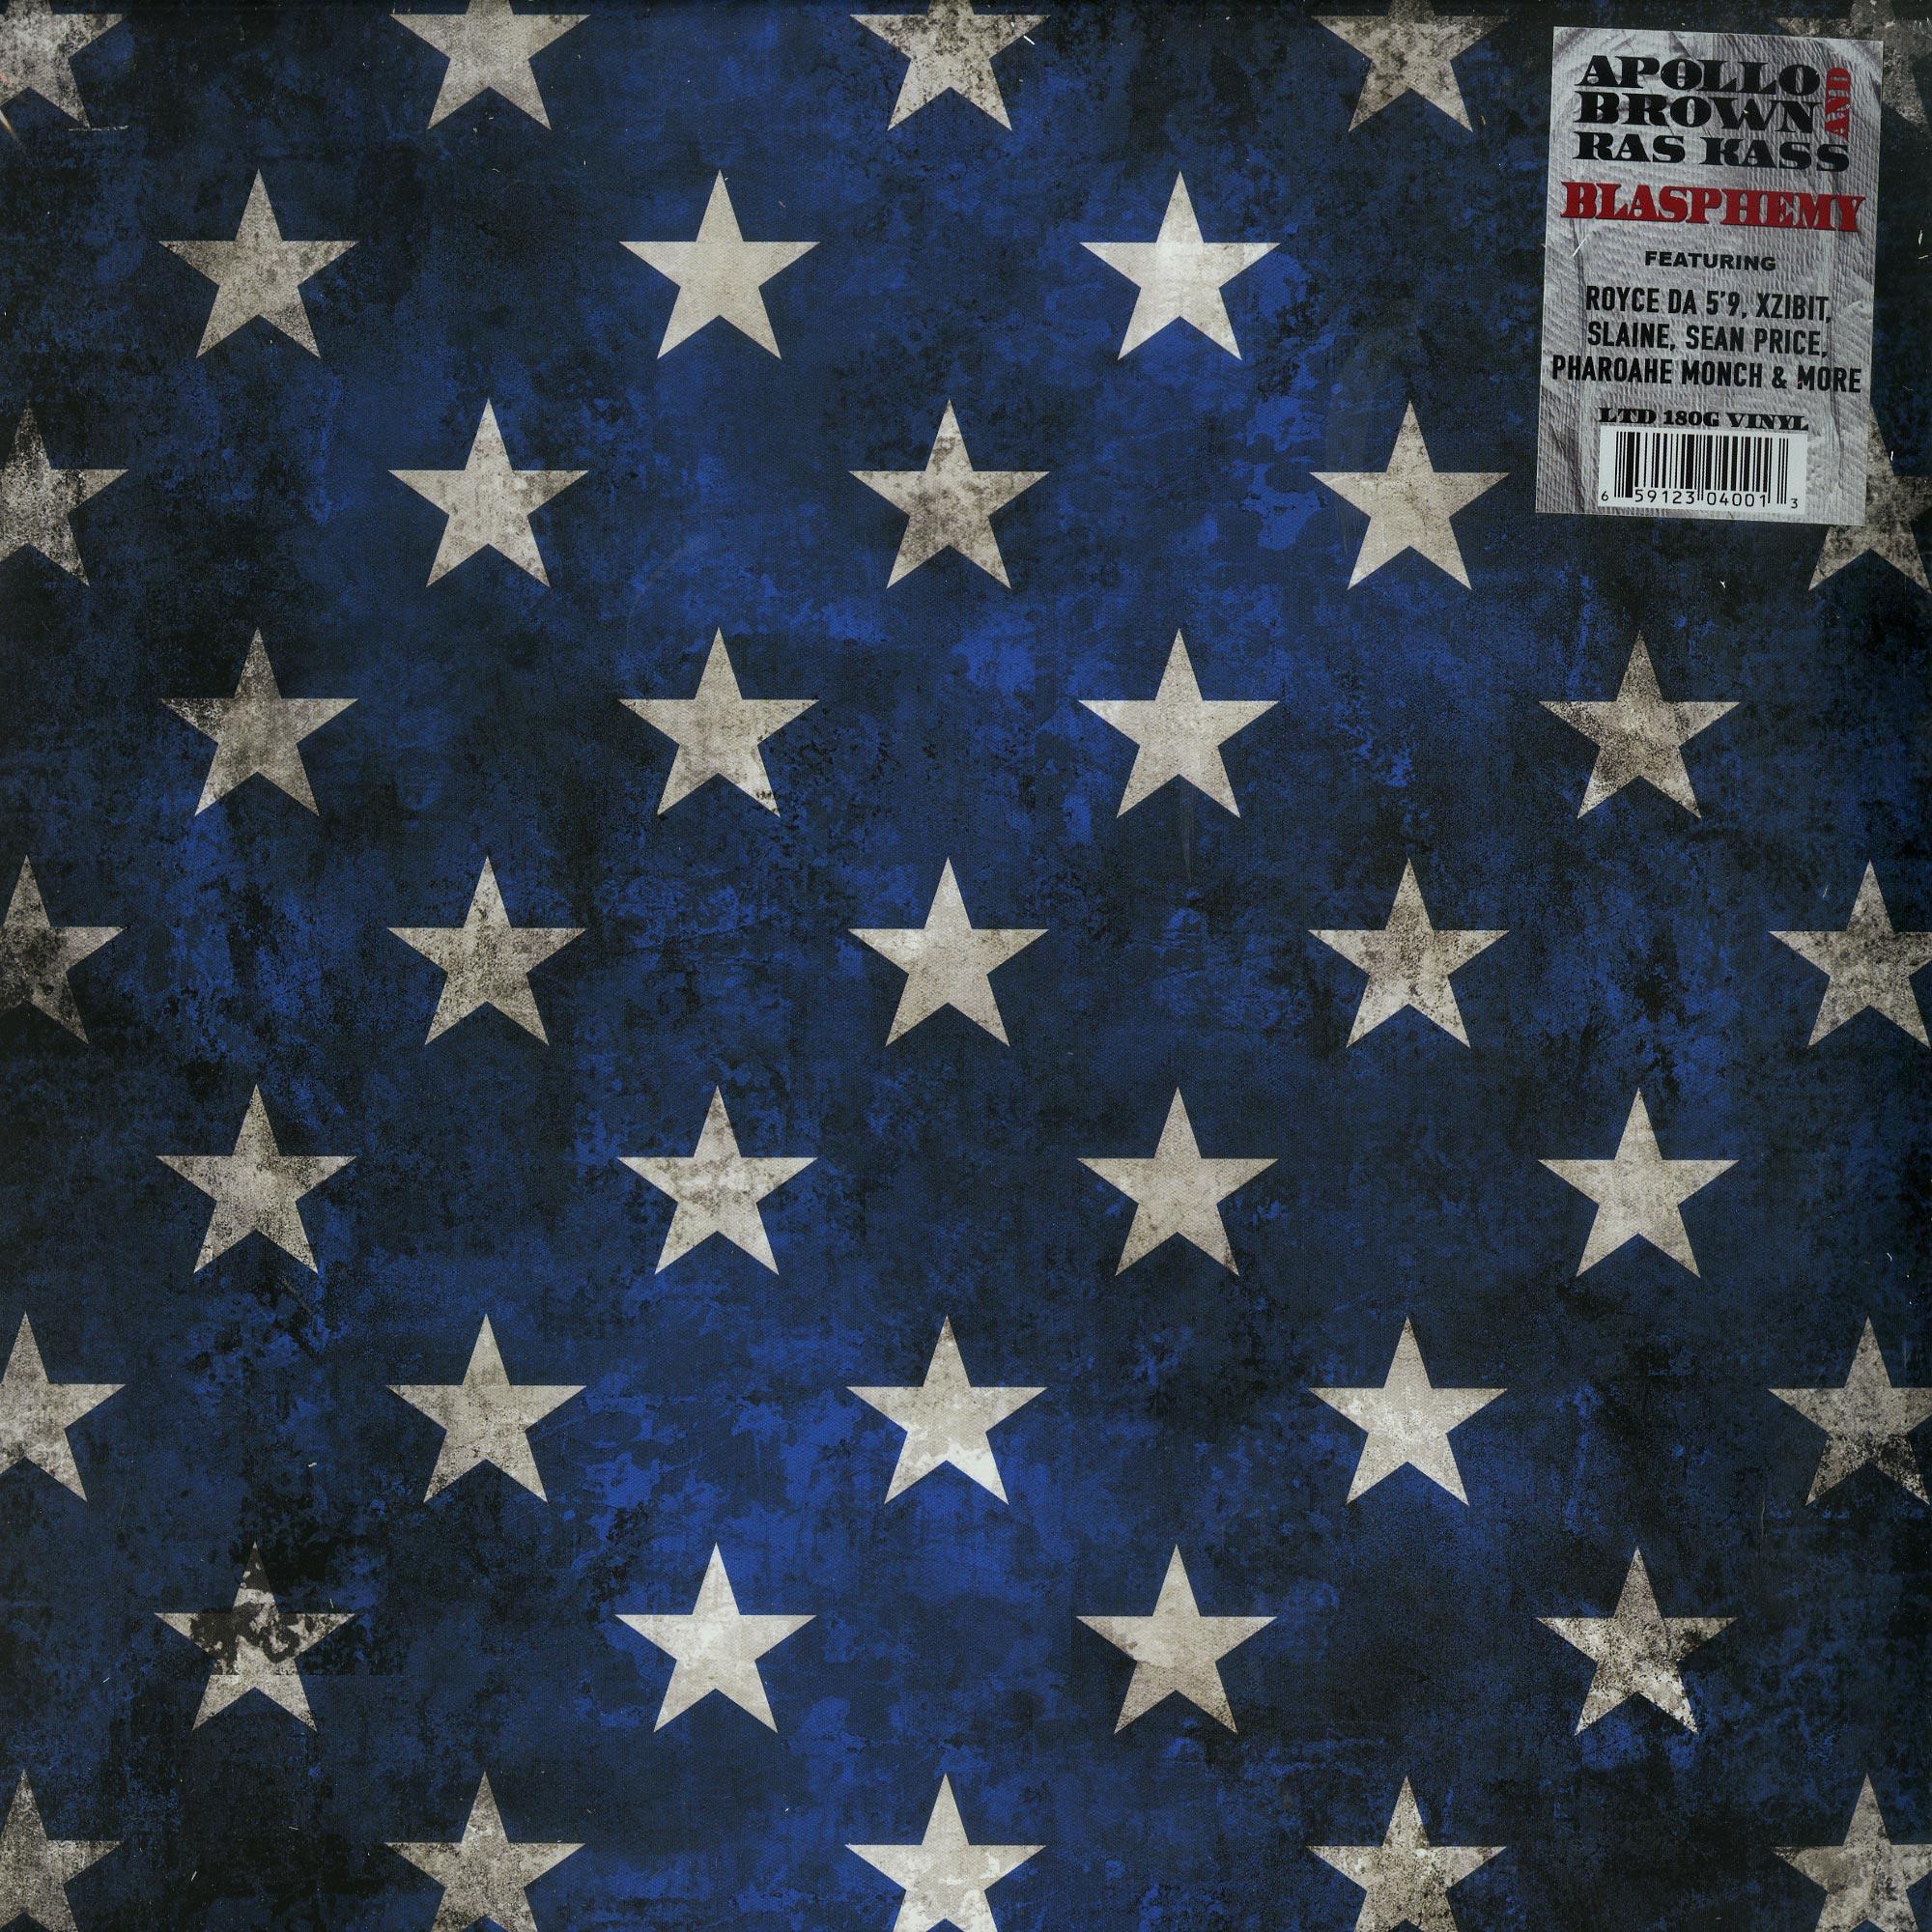 Apollo Brown & Ras Kass - BLASPHEMY